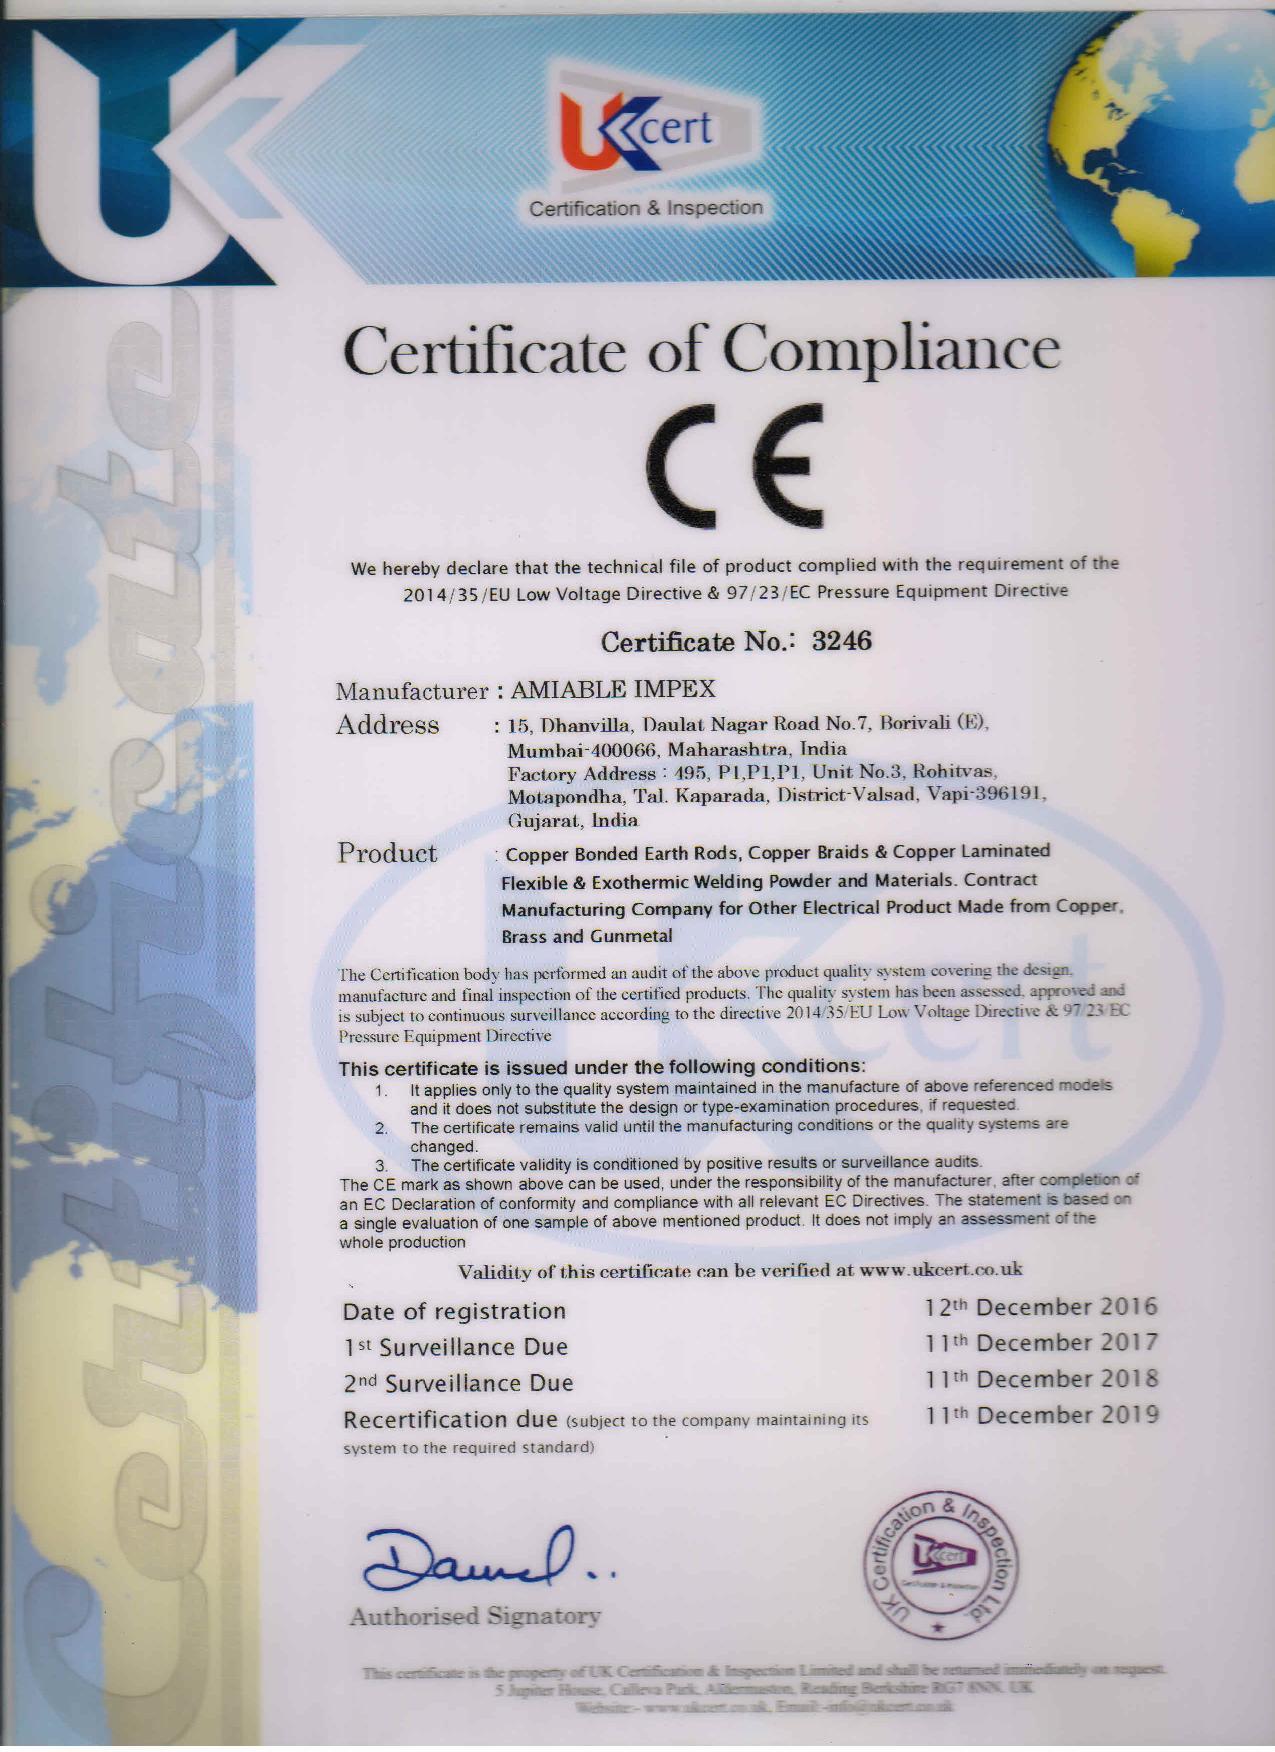 Pressure Equipment Directive 97/23/EC